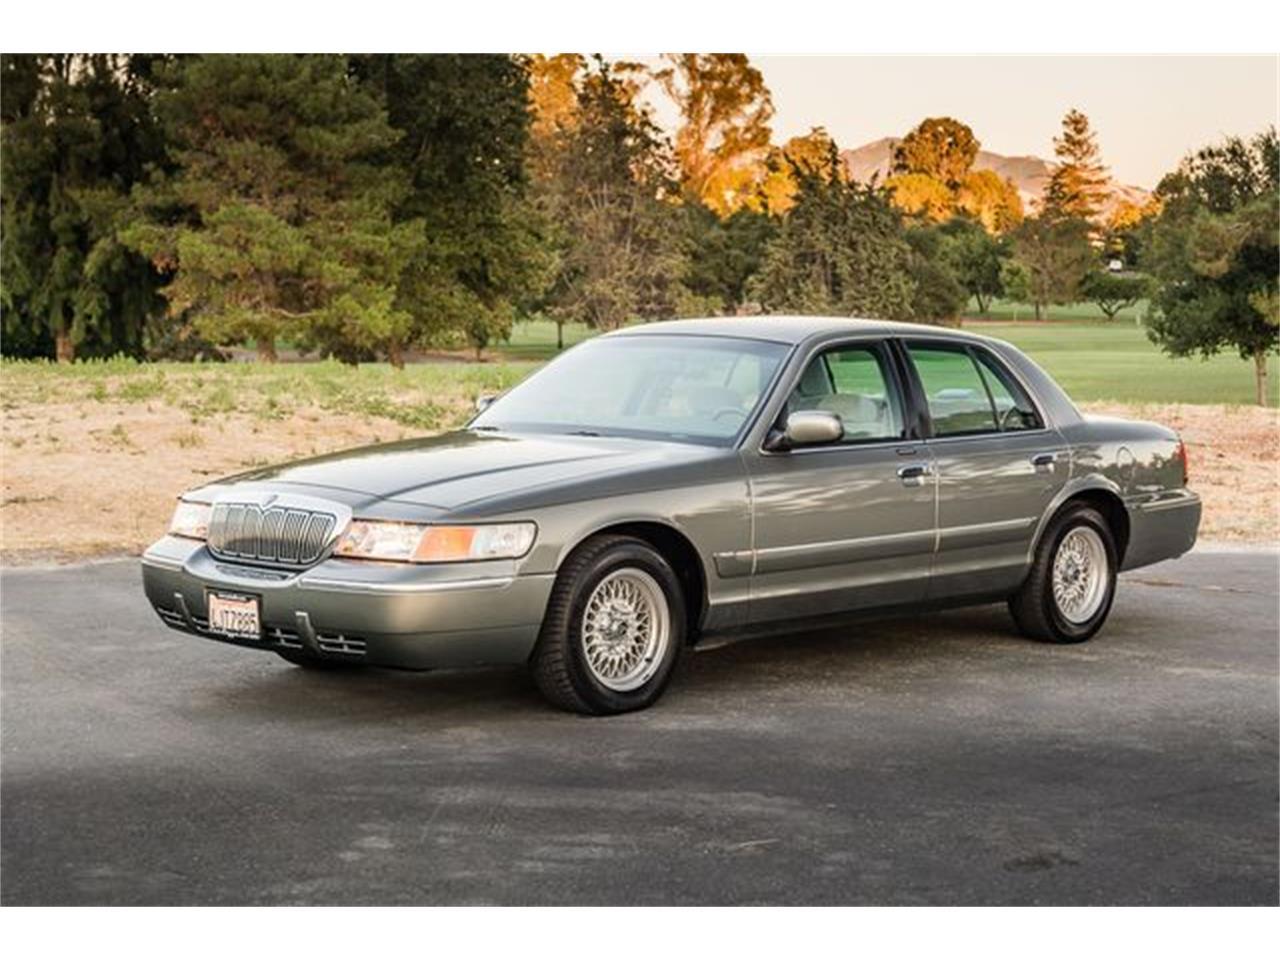 2000 Mercury Grand Marquis For Sale